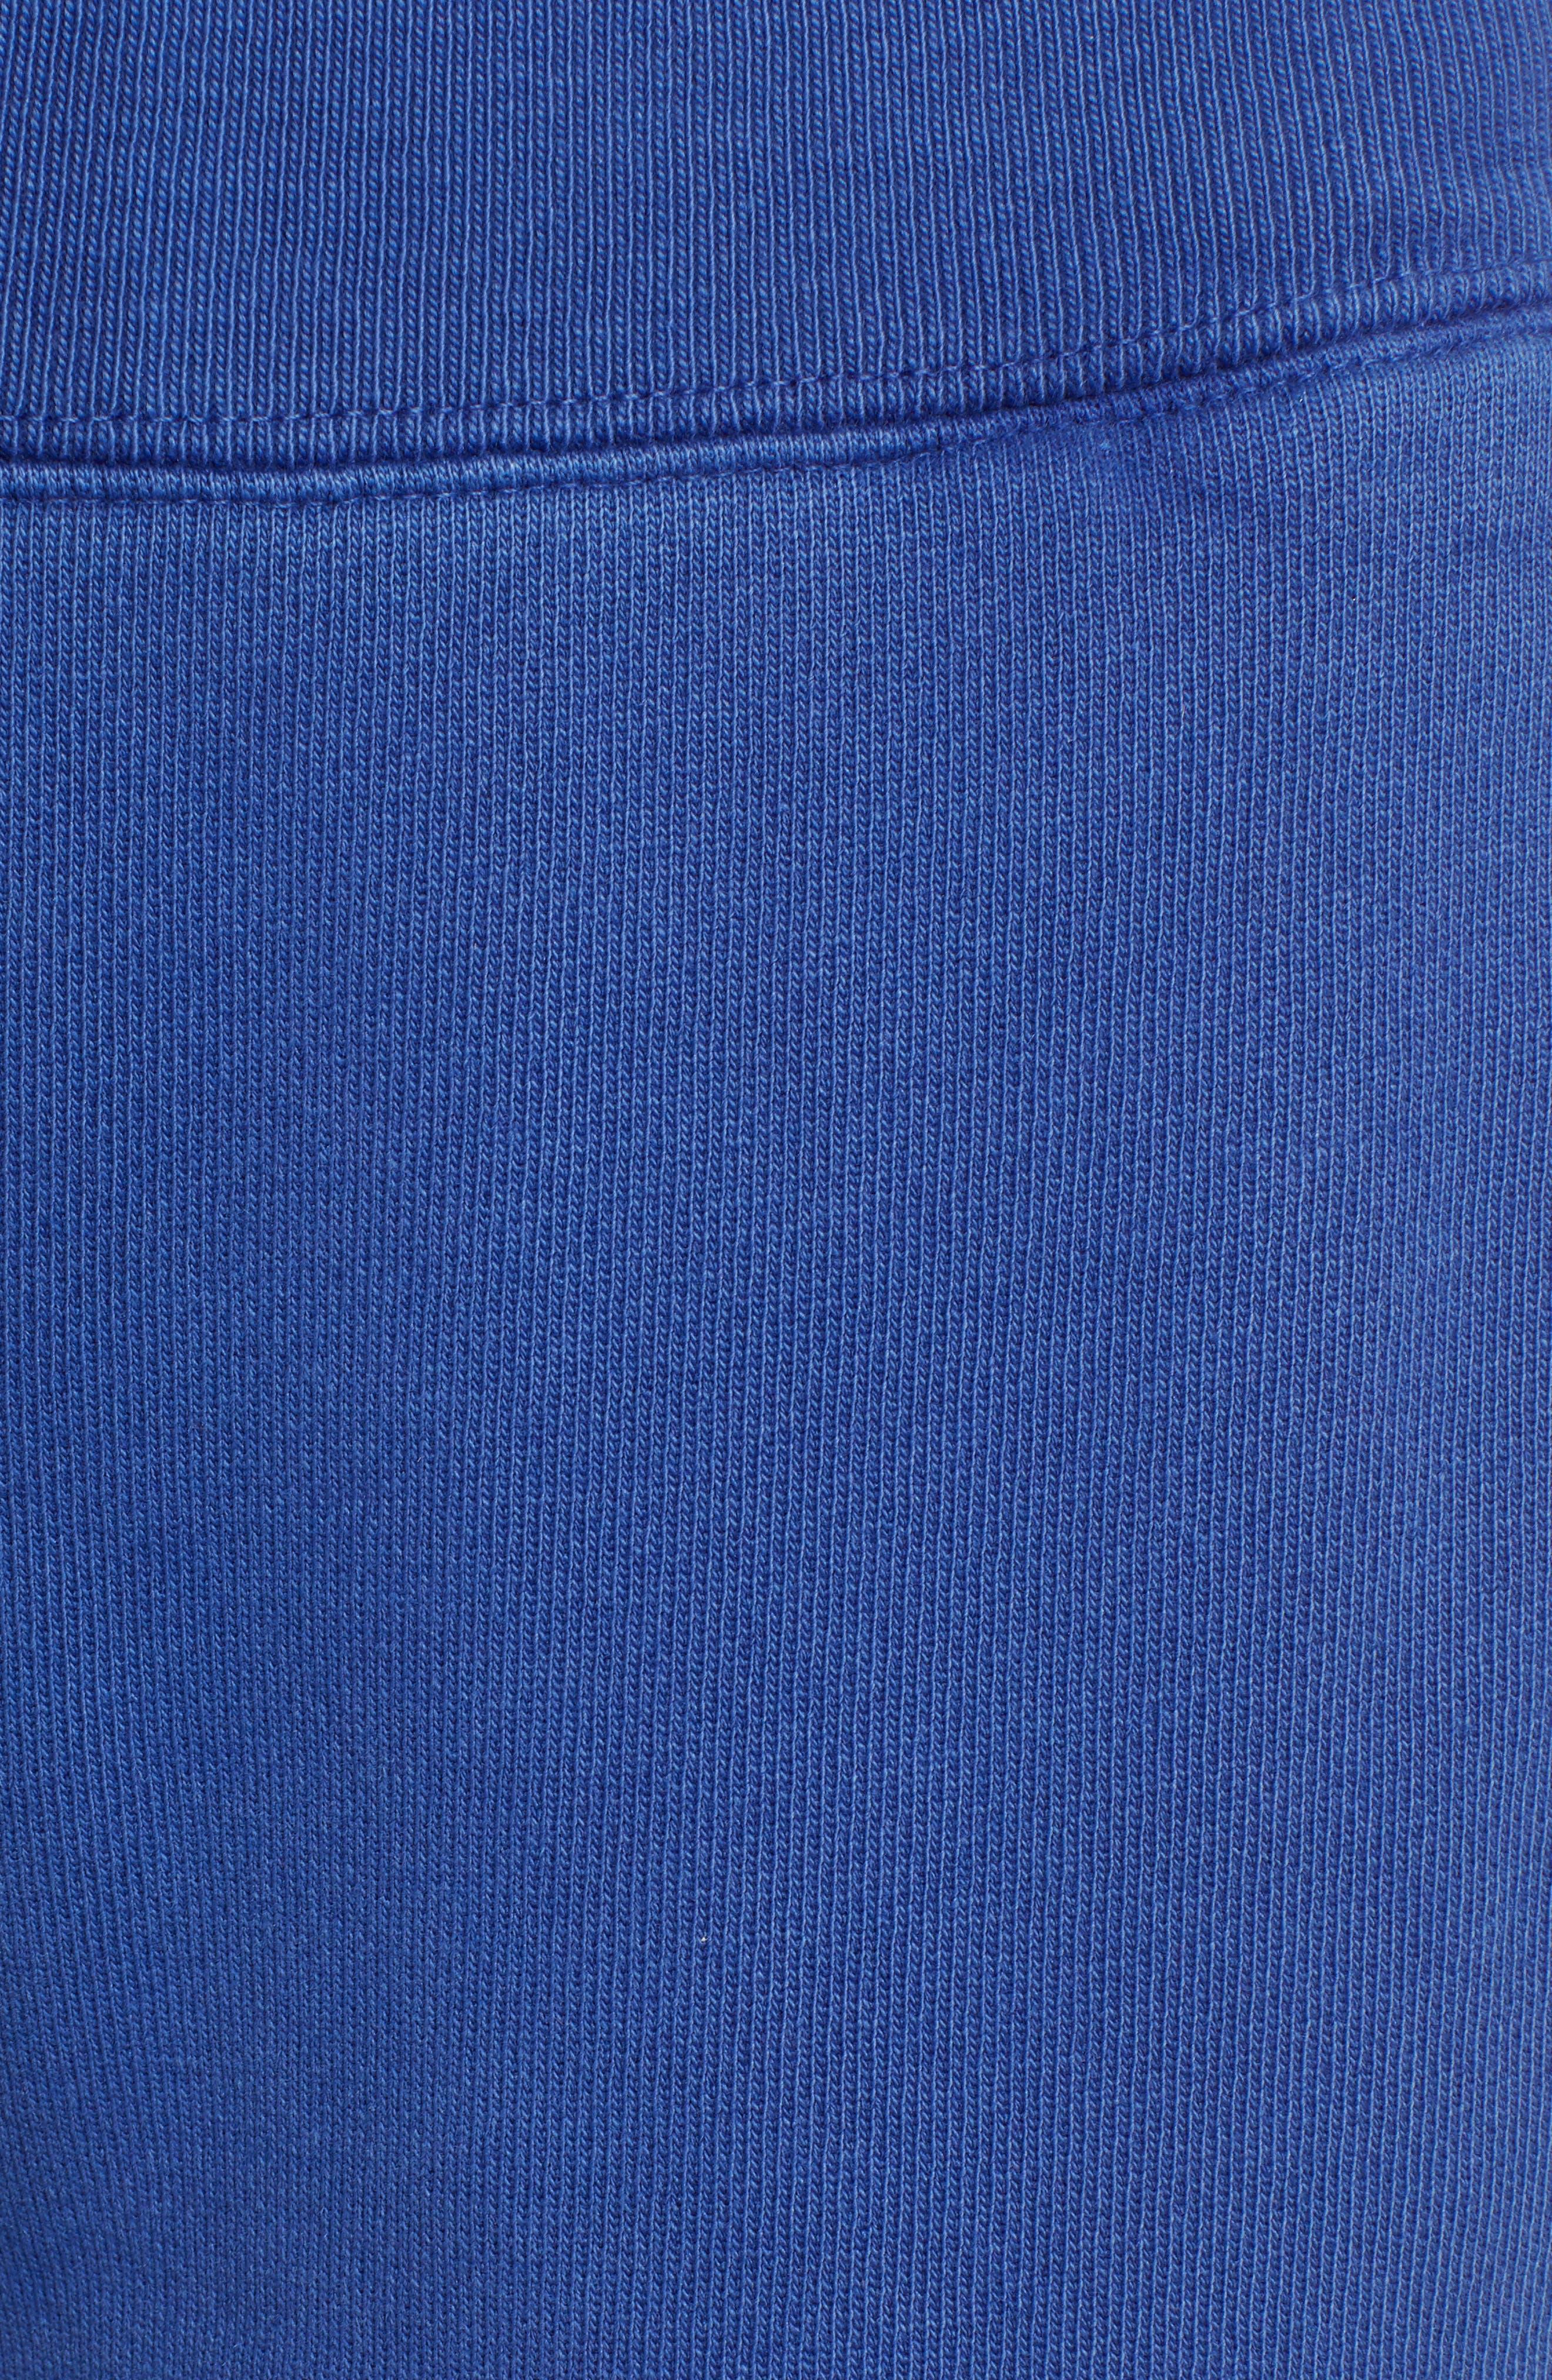 CHAMPION, Garment Dyed Jogger Pants, Alternate thumbnail 6, color, 400